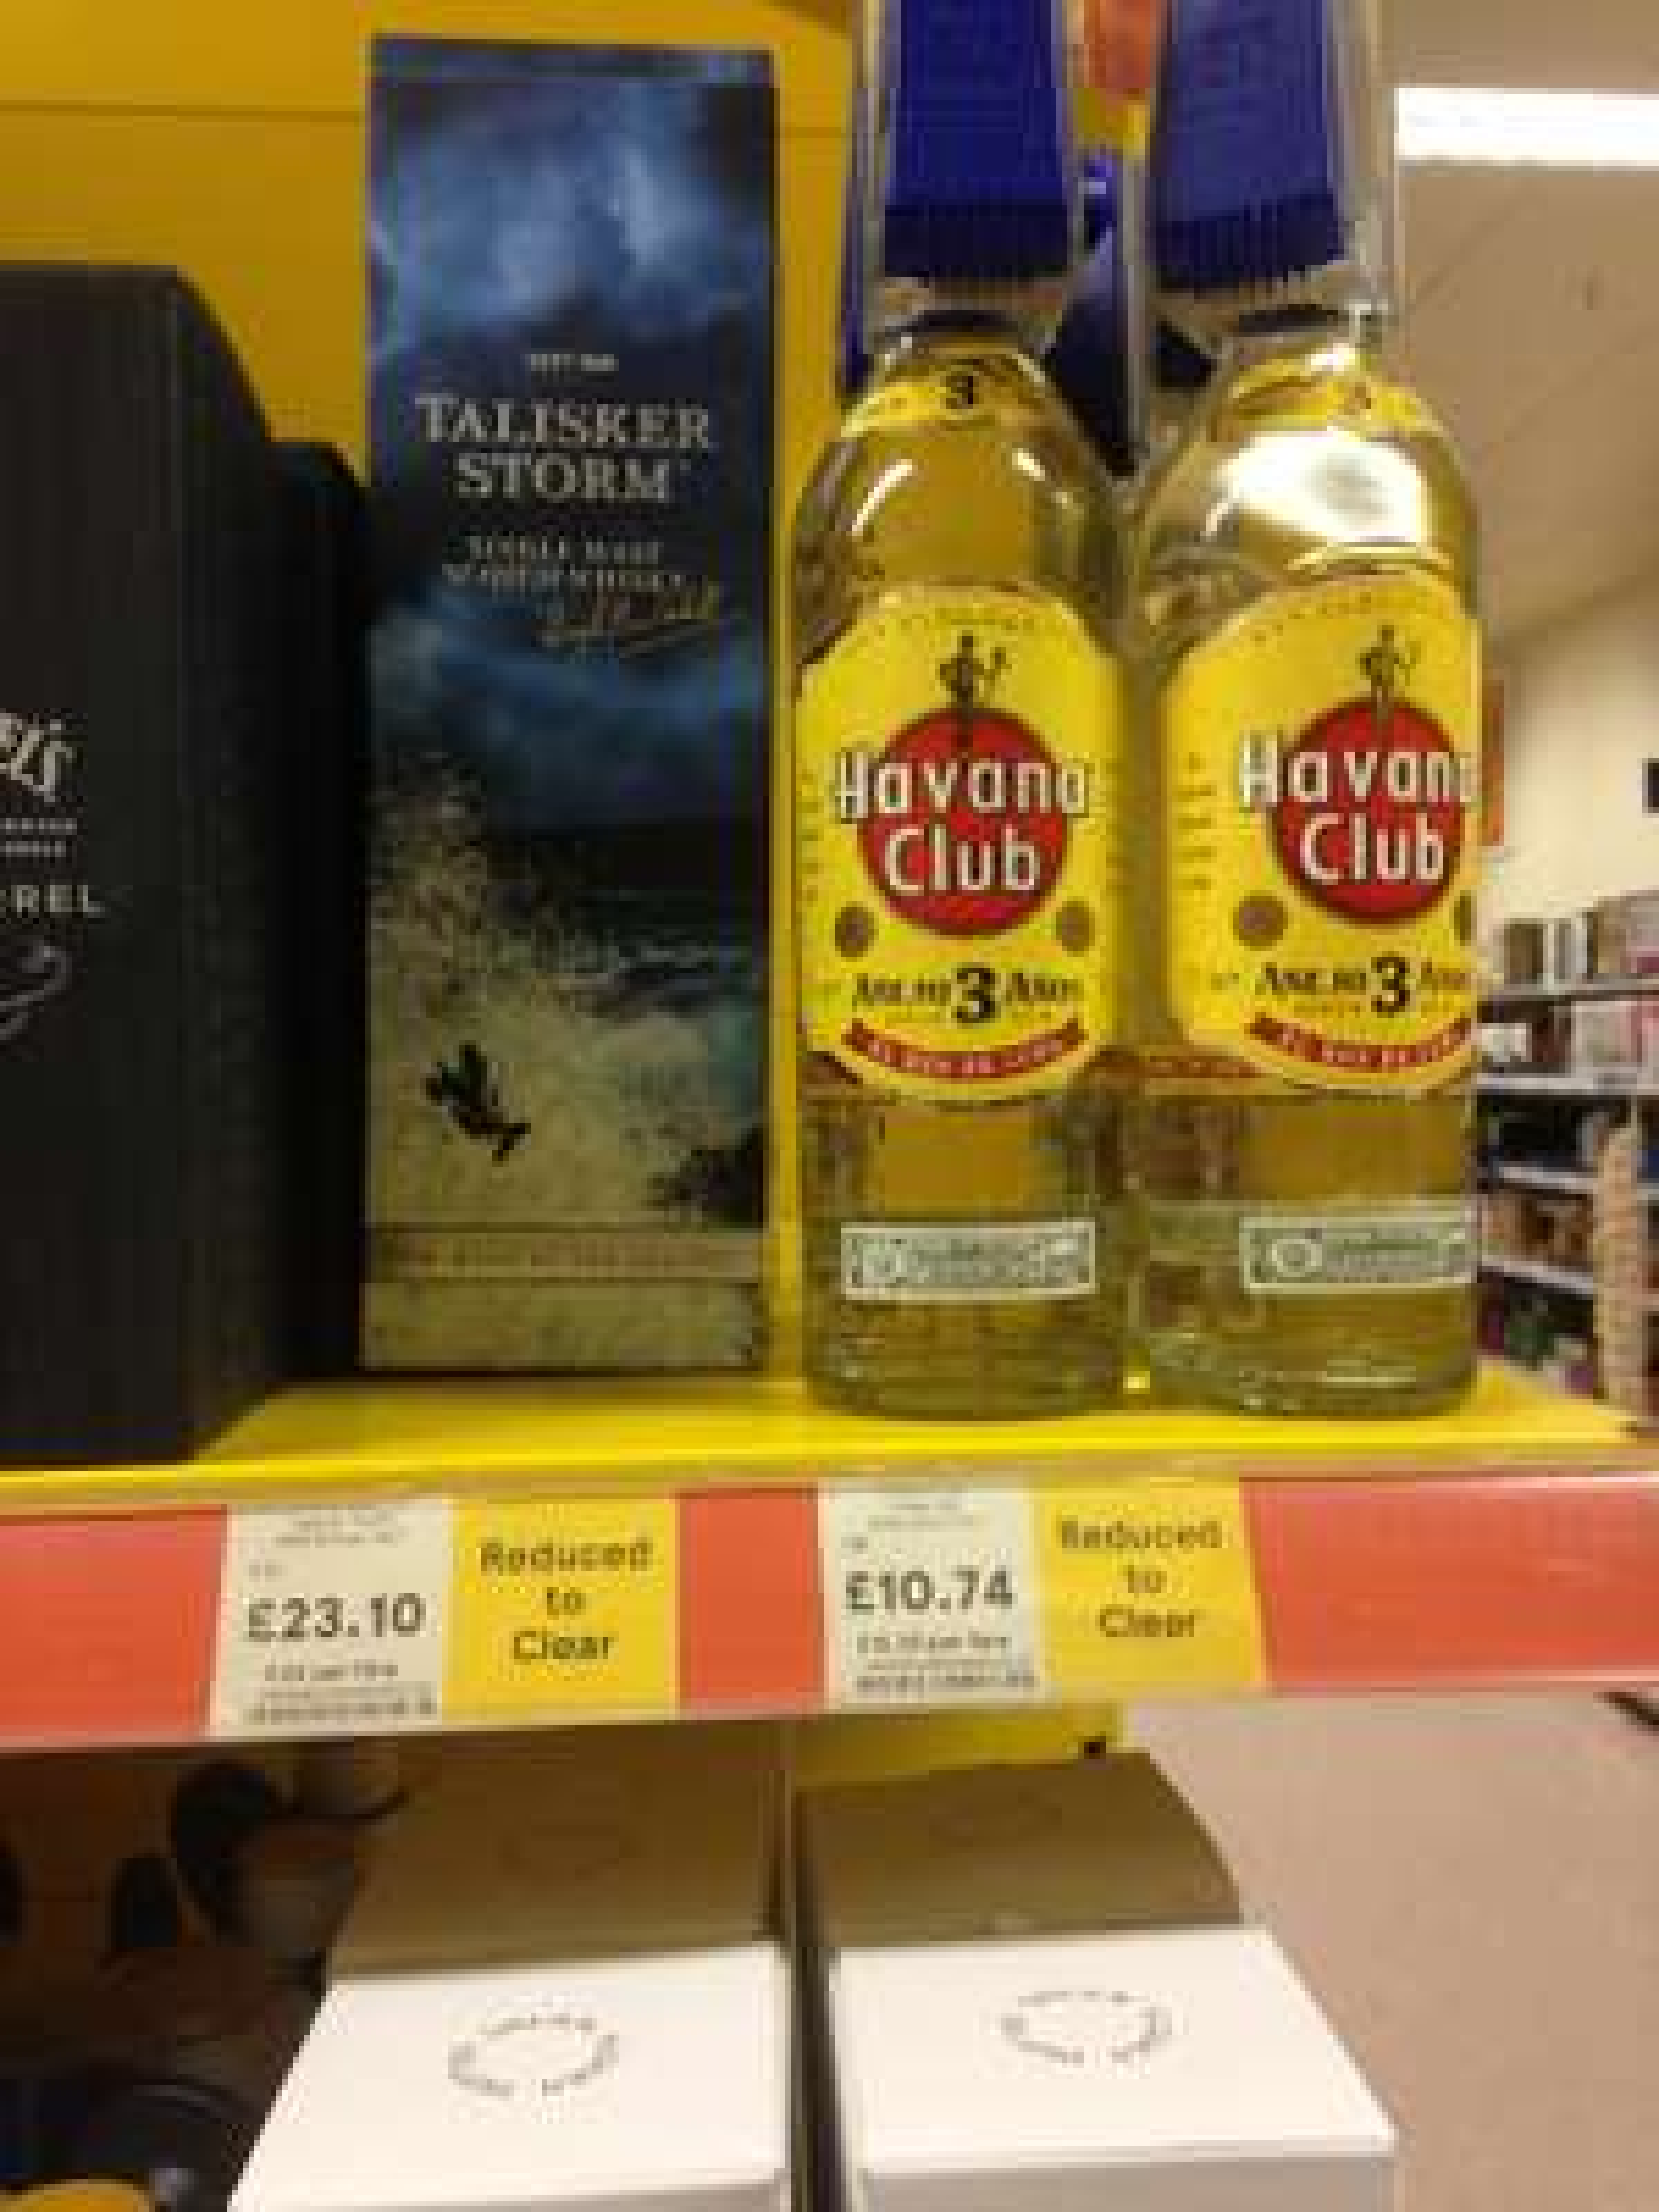 Talisker Storm Single Malt Scotch Whisky, 70cl - £23.10 reduced to clear Tesco